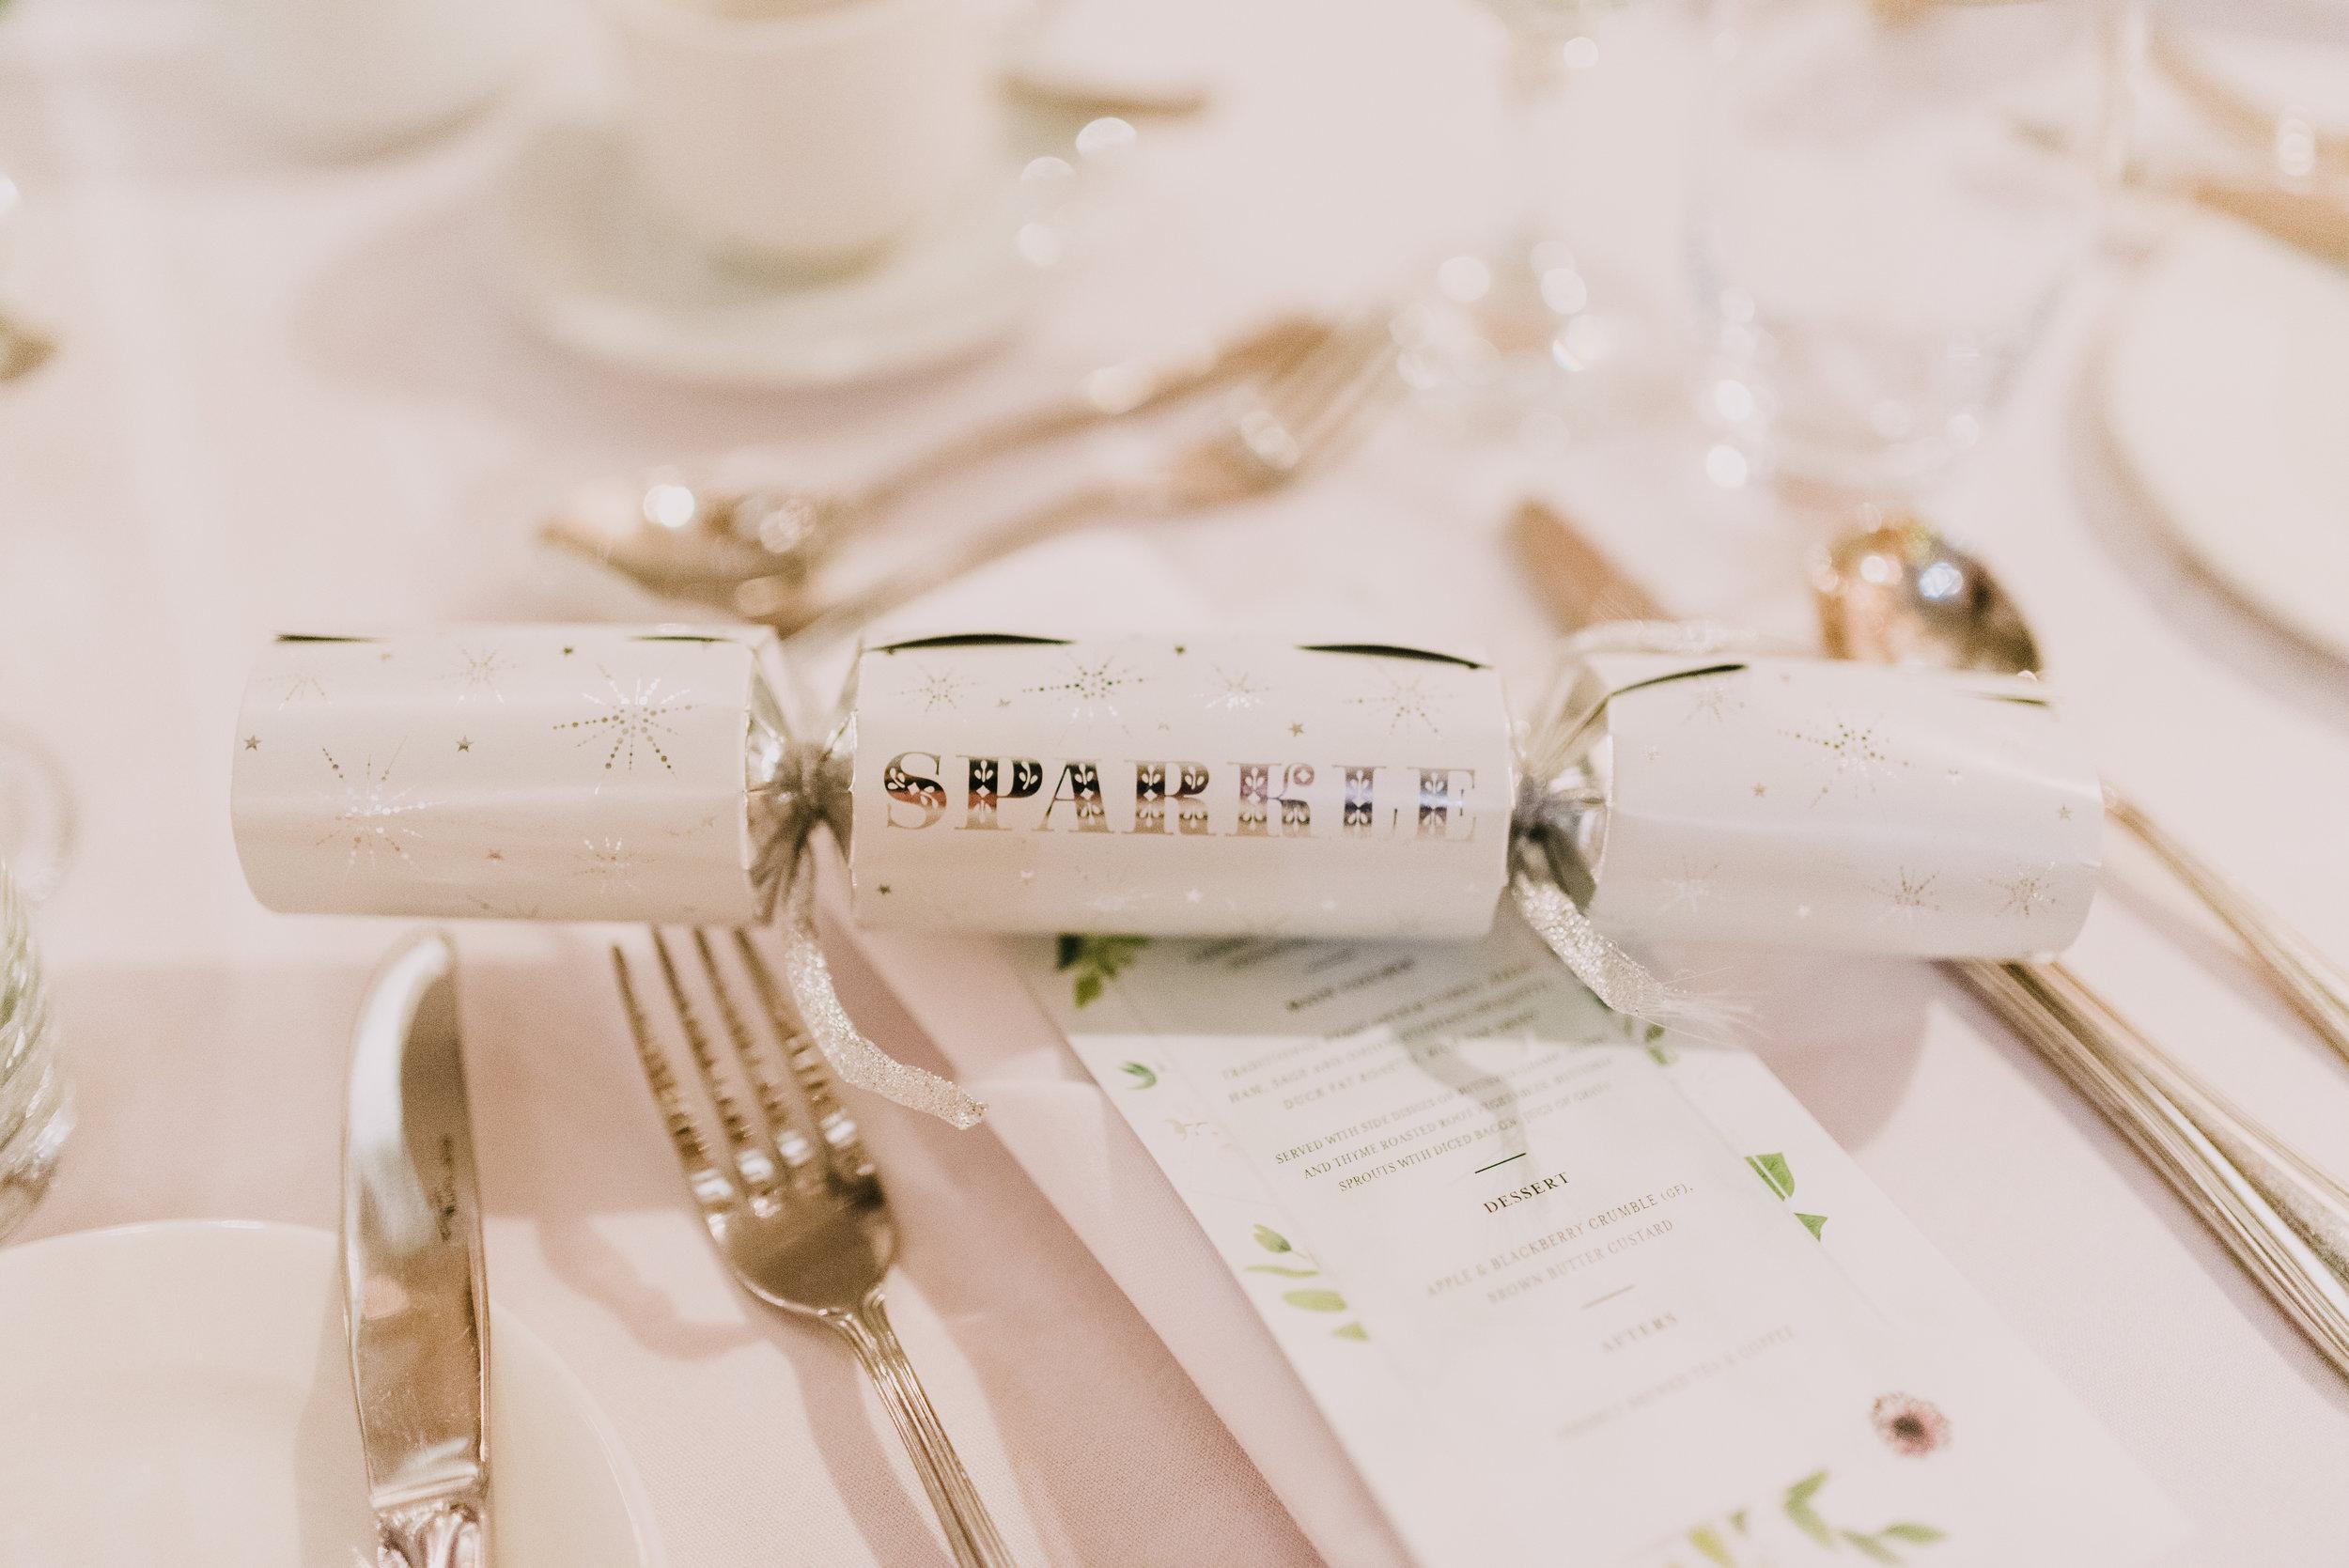 larchfield estate wedding, wedding venues northern ireland, barn wedding venues northern ireland, wedding photos larchfield estate, shane todd wedding, larchfield wedding decor ideas (6).jpg